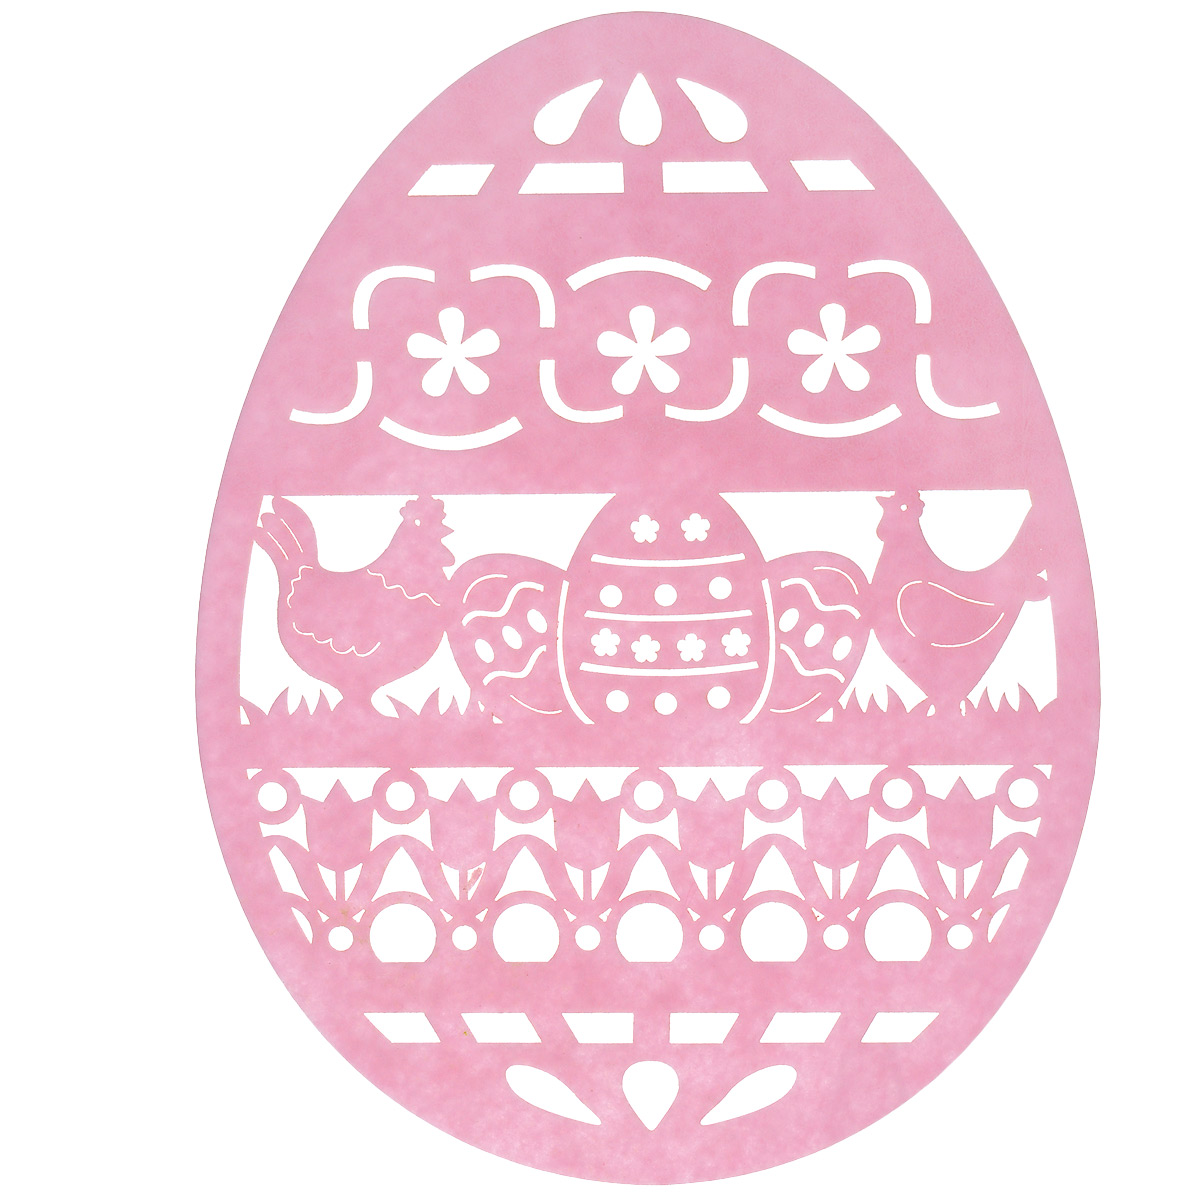 Салфетка Home Queen Веселый праздник, цвет: розовый, 25 х 33 х 0,2 см мебель 33 комода